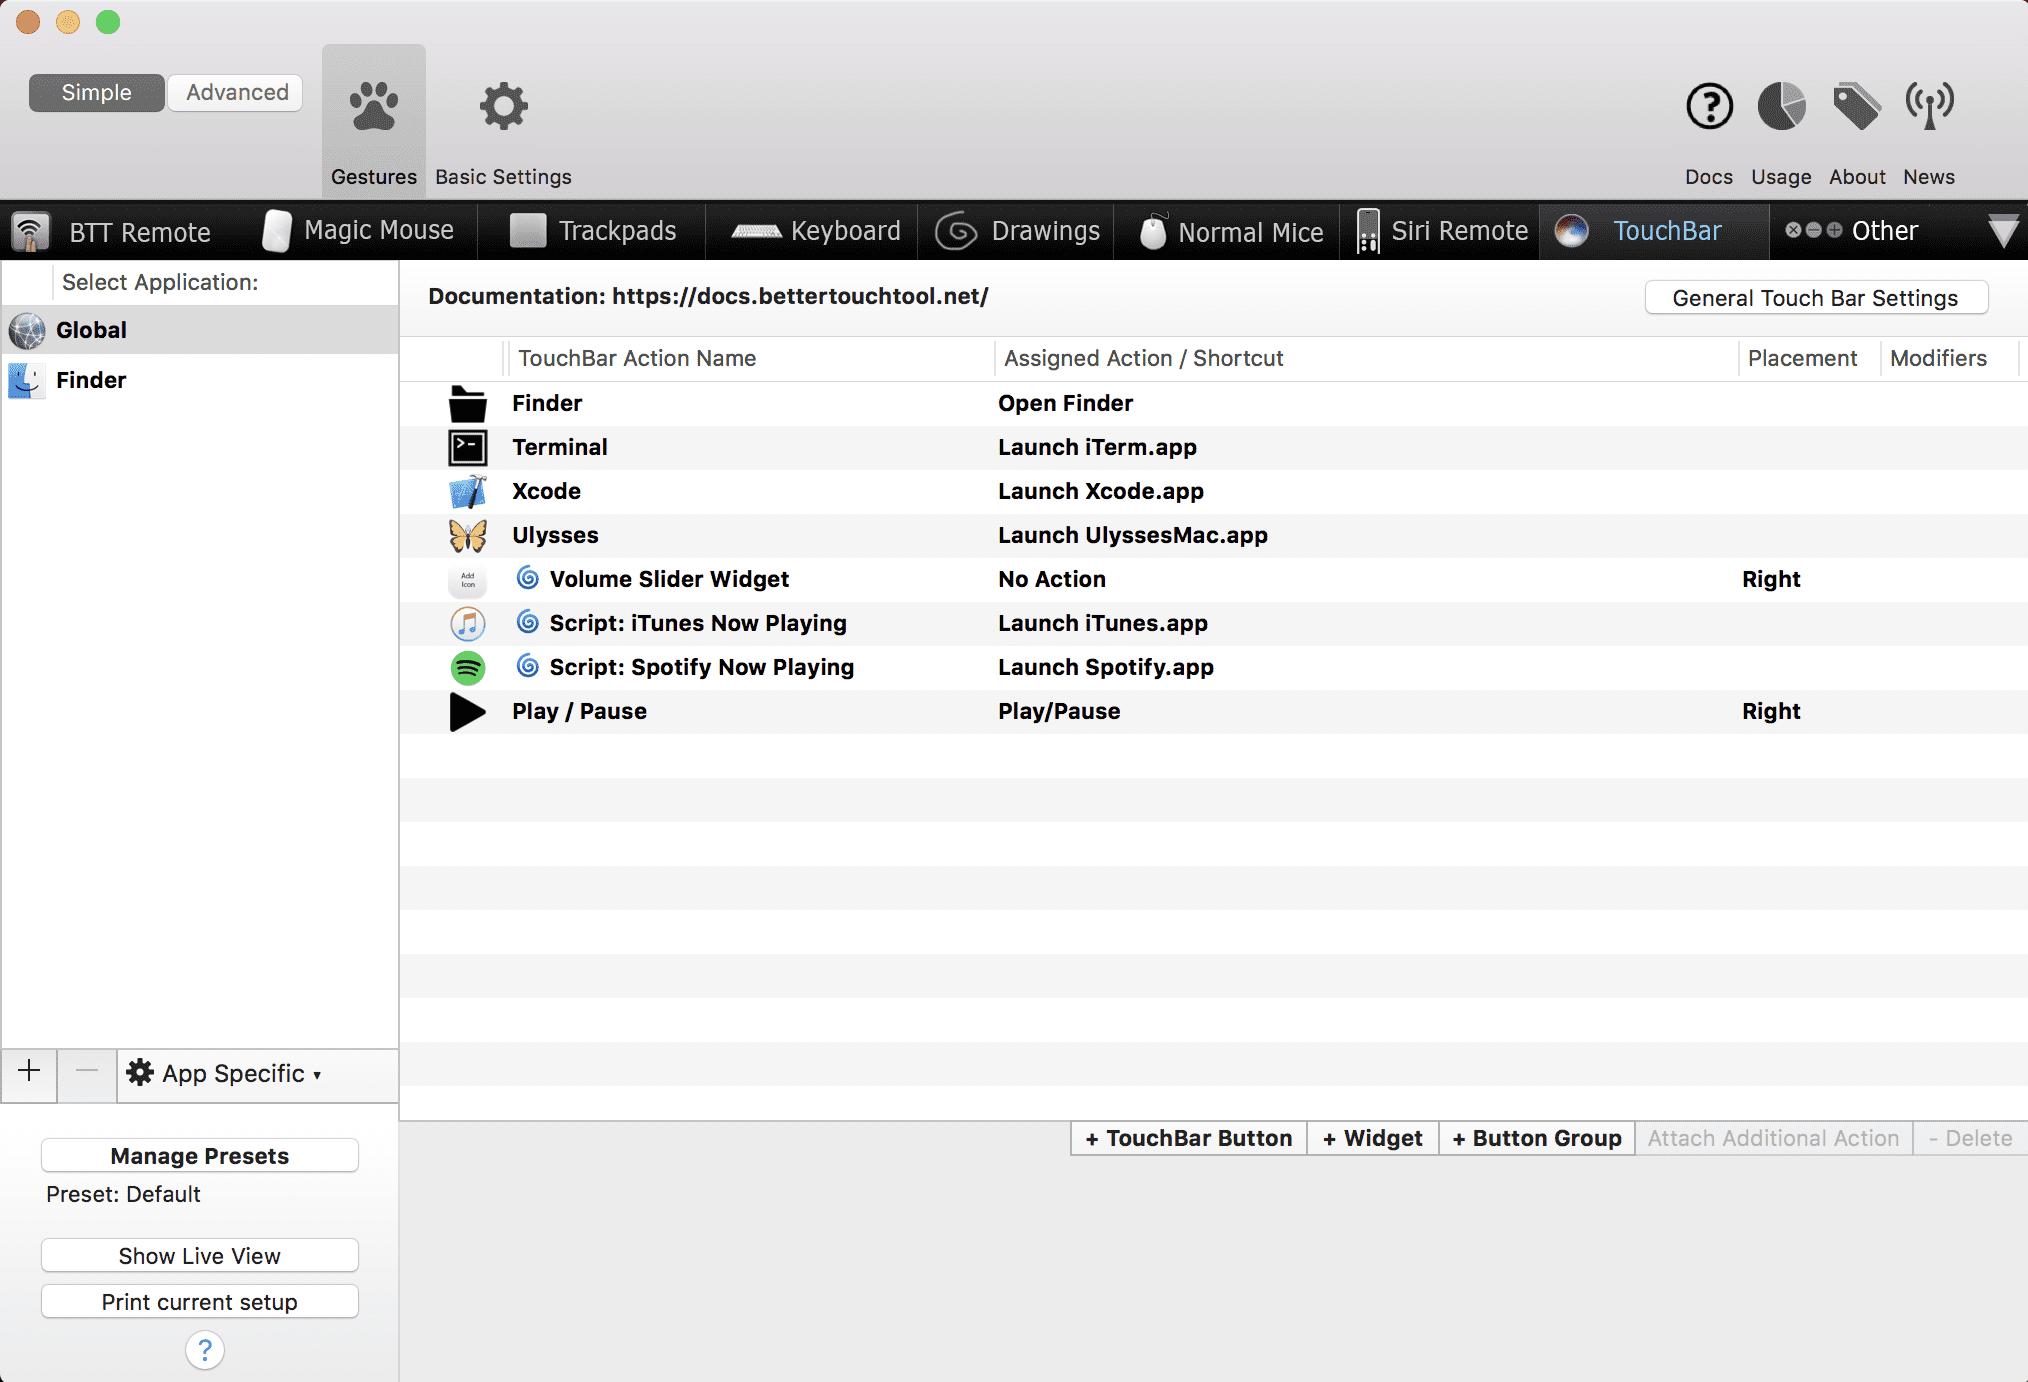 Screenshot of BetterTouchTool Setapp 4 21 18 11 51 22 PM